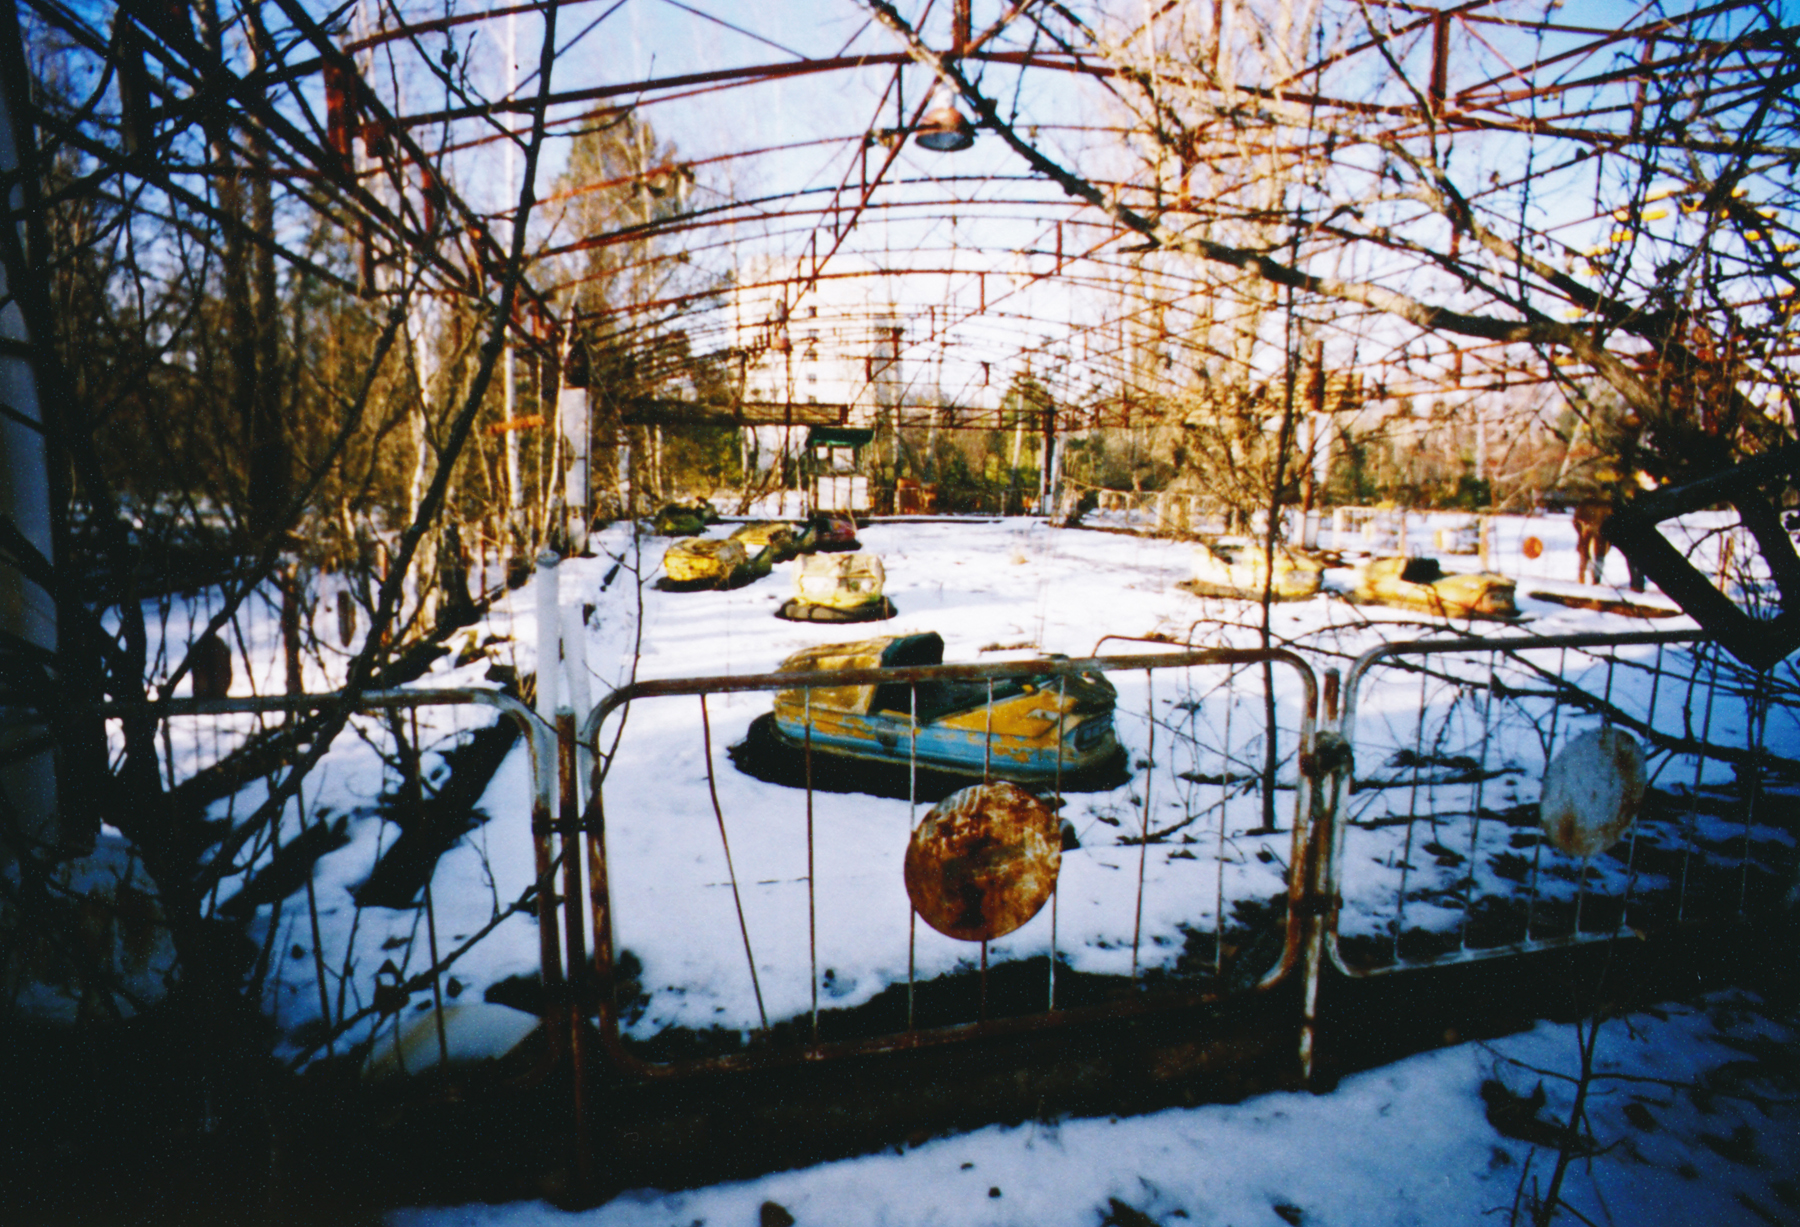 chernobyl richard p j lambert film shooters collective rpjl chernobyl 3 jpg